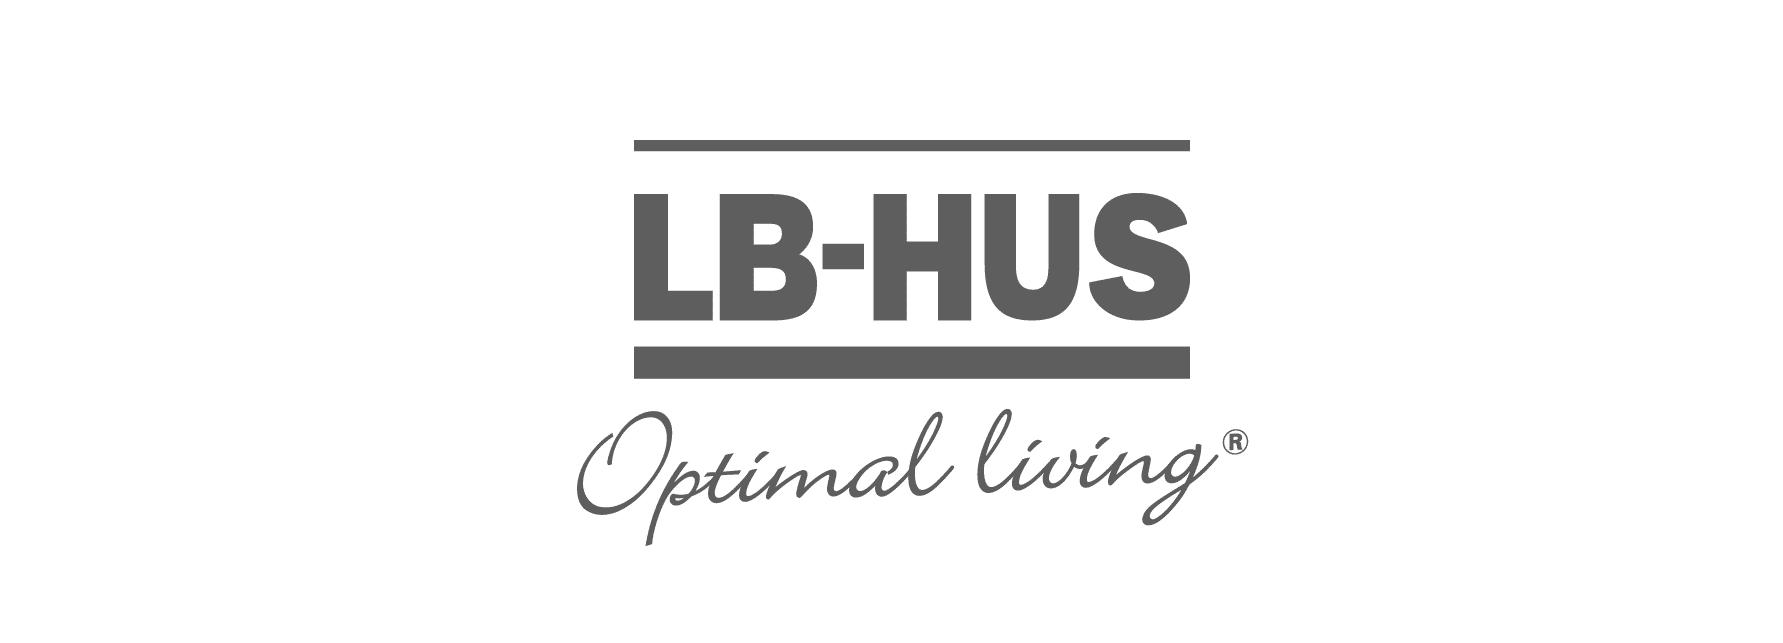 LB_hus